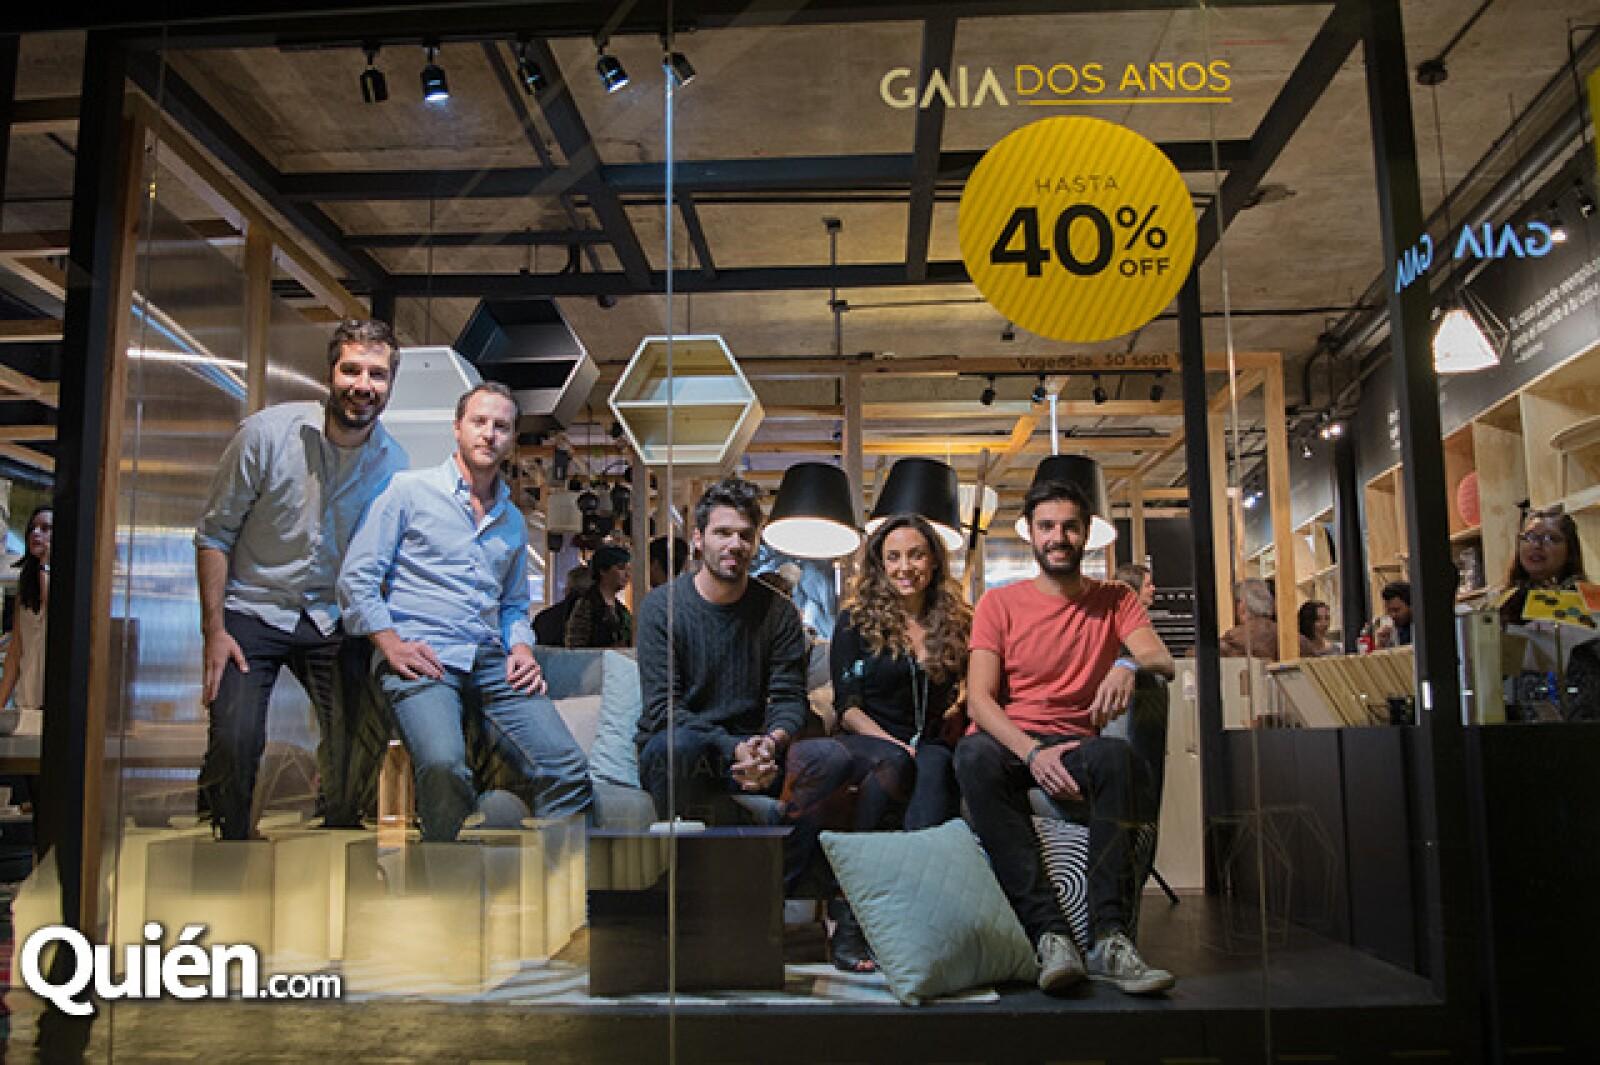 Gustavo Coimbra, Raafello Starace, Philippe Cahuzac, Marion Cortina y Hassan Yassin